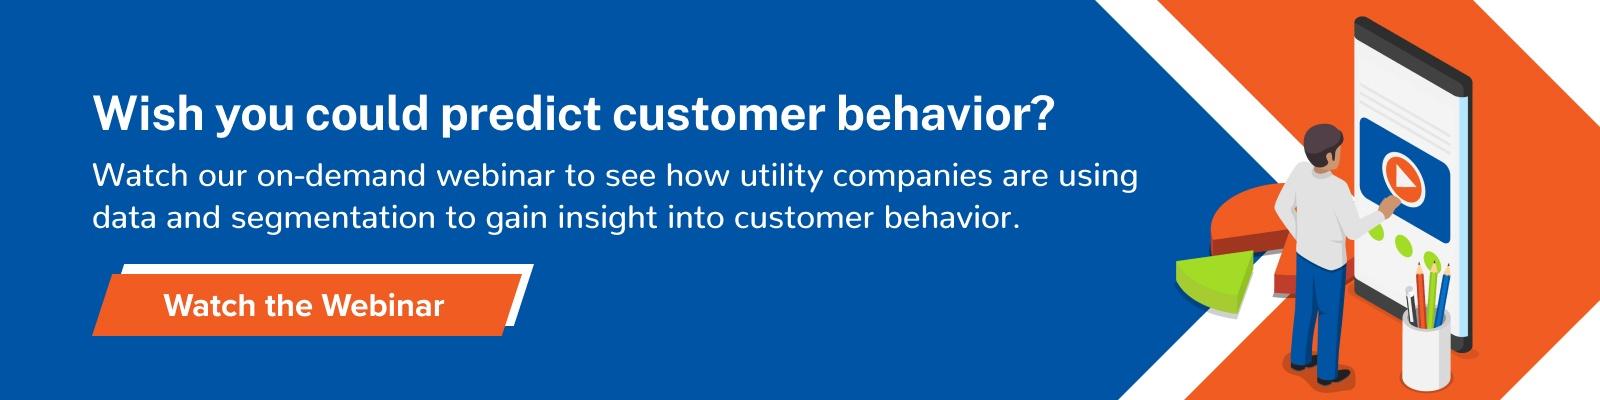 Utility data segmentation webinar helps build a more effective customer journey CTA